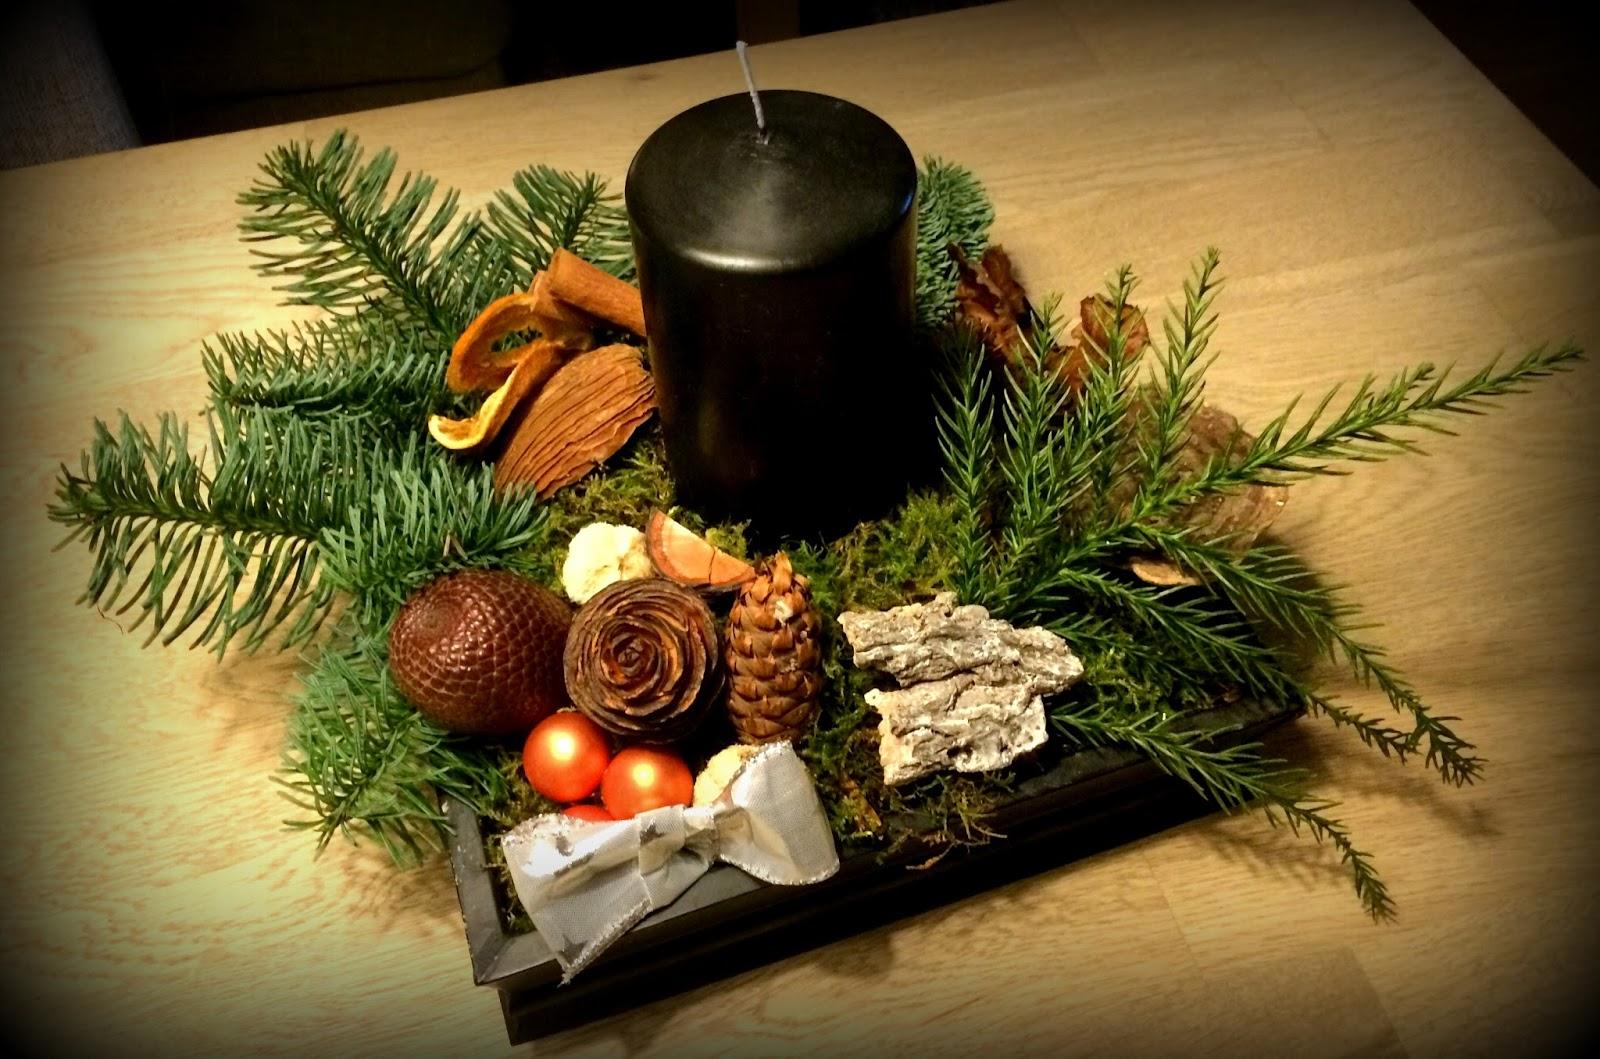 Jea's Blanke Tanker: Årets Juledekorationer.